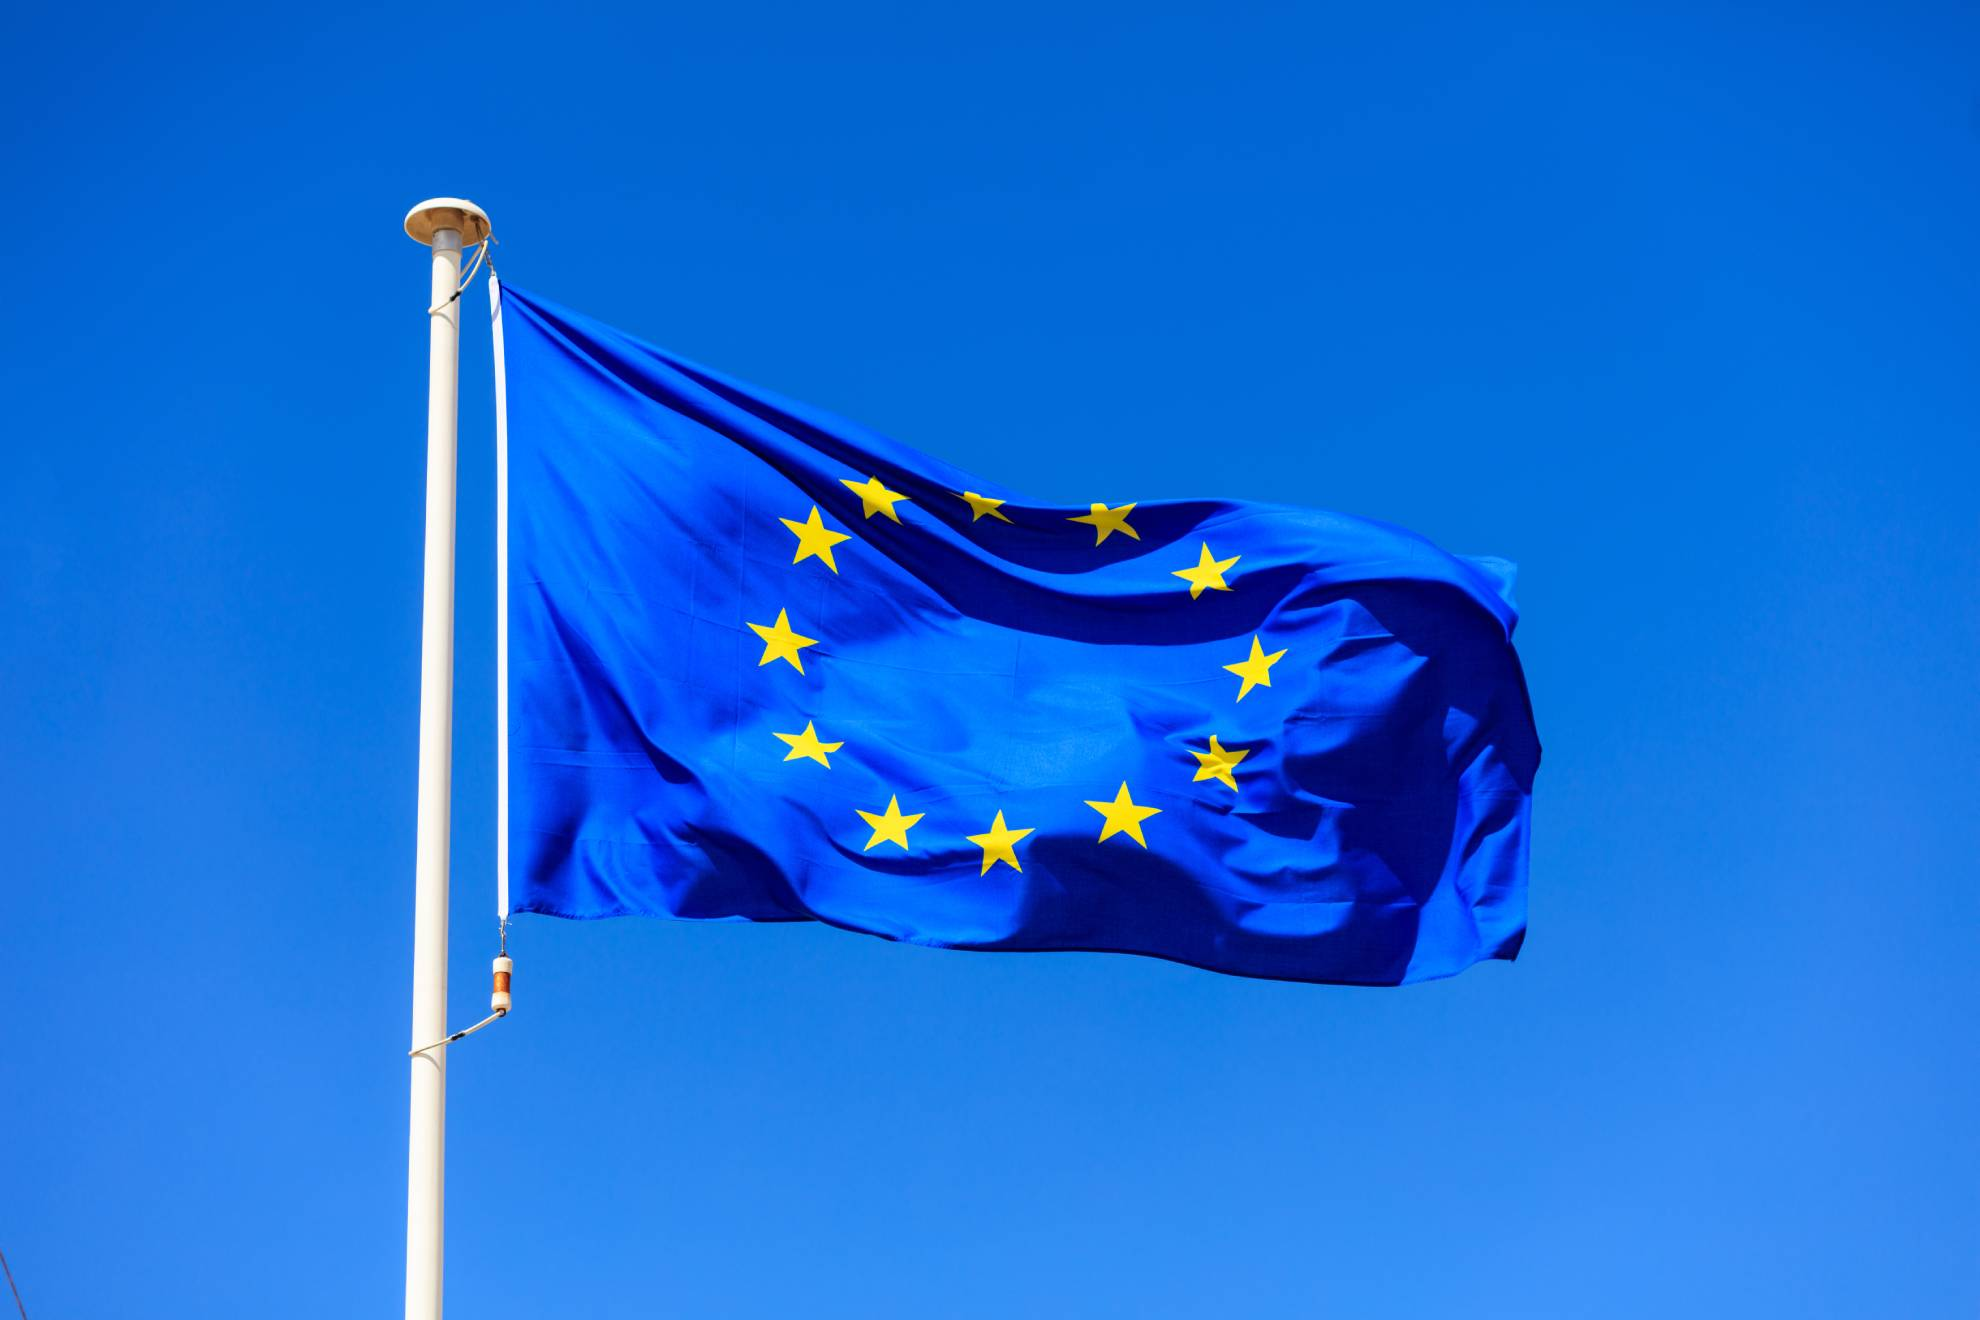 eu-flag-european-union-flag-on-a-pole-waving-on-bl-P5QSR3A (1)